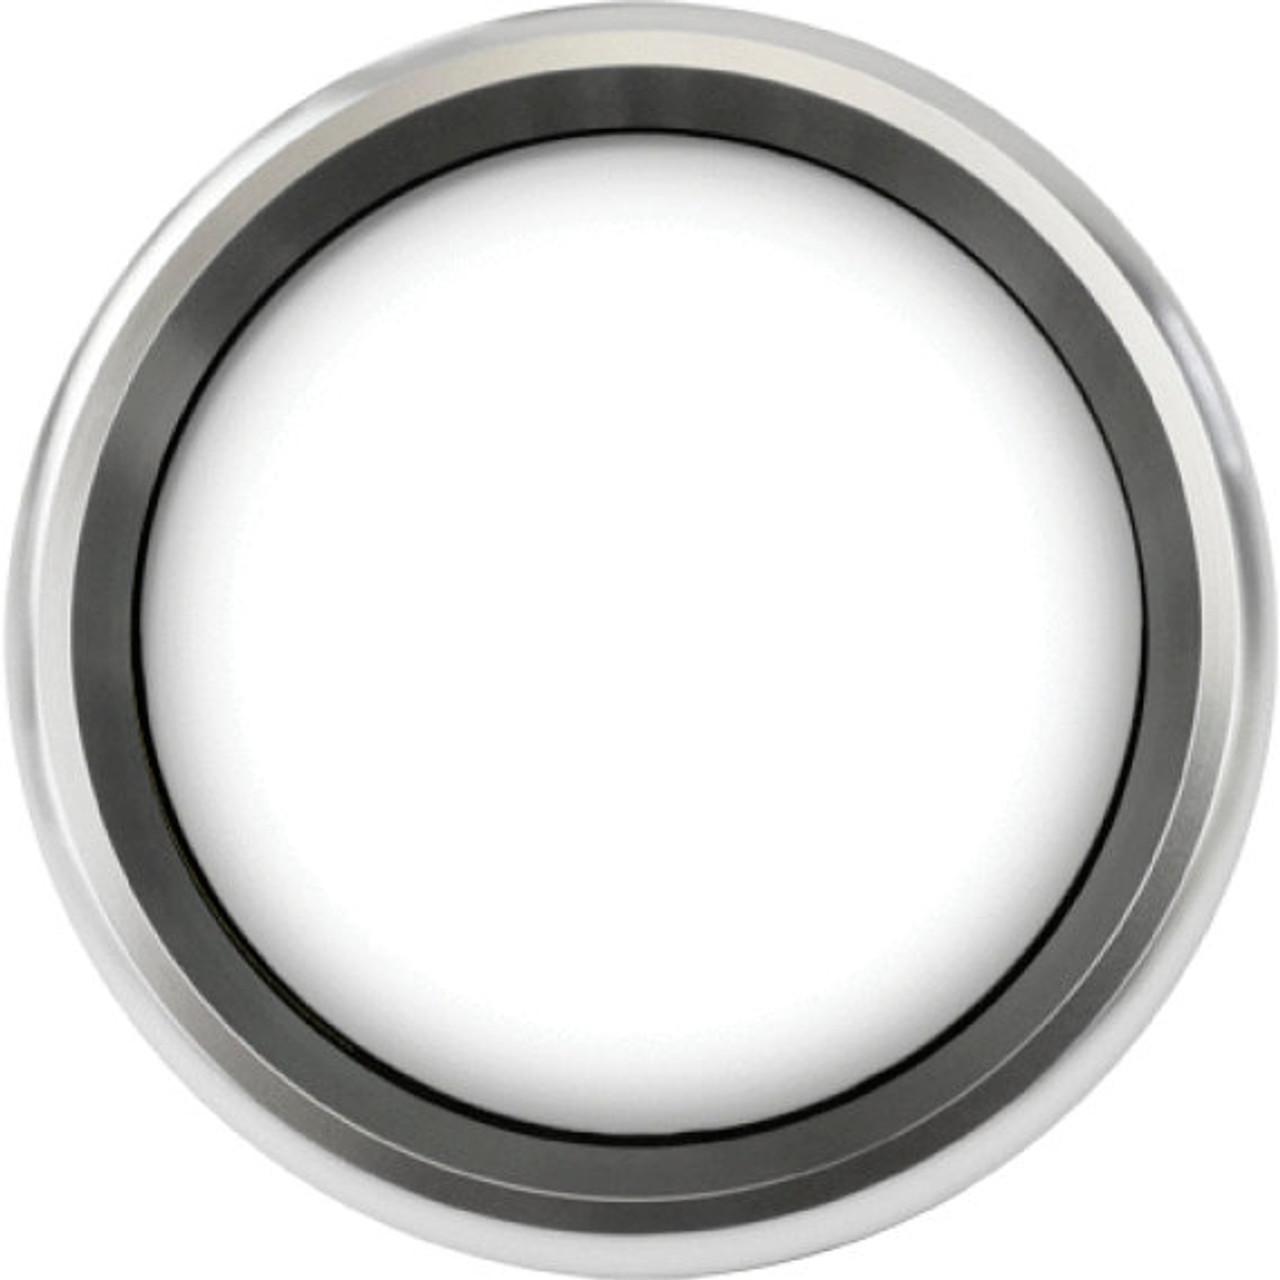 "Revolution Silver Replacement Bezel for 2-5/8"" gauge"